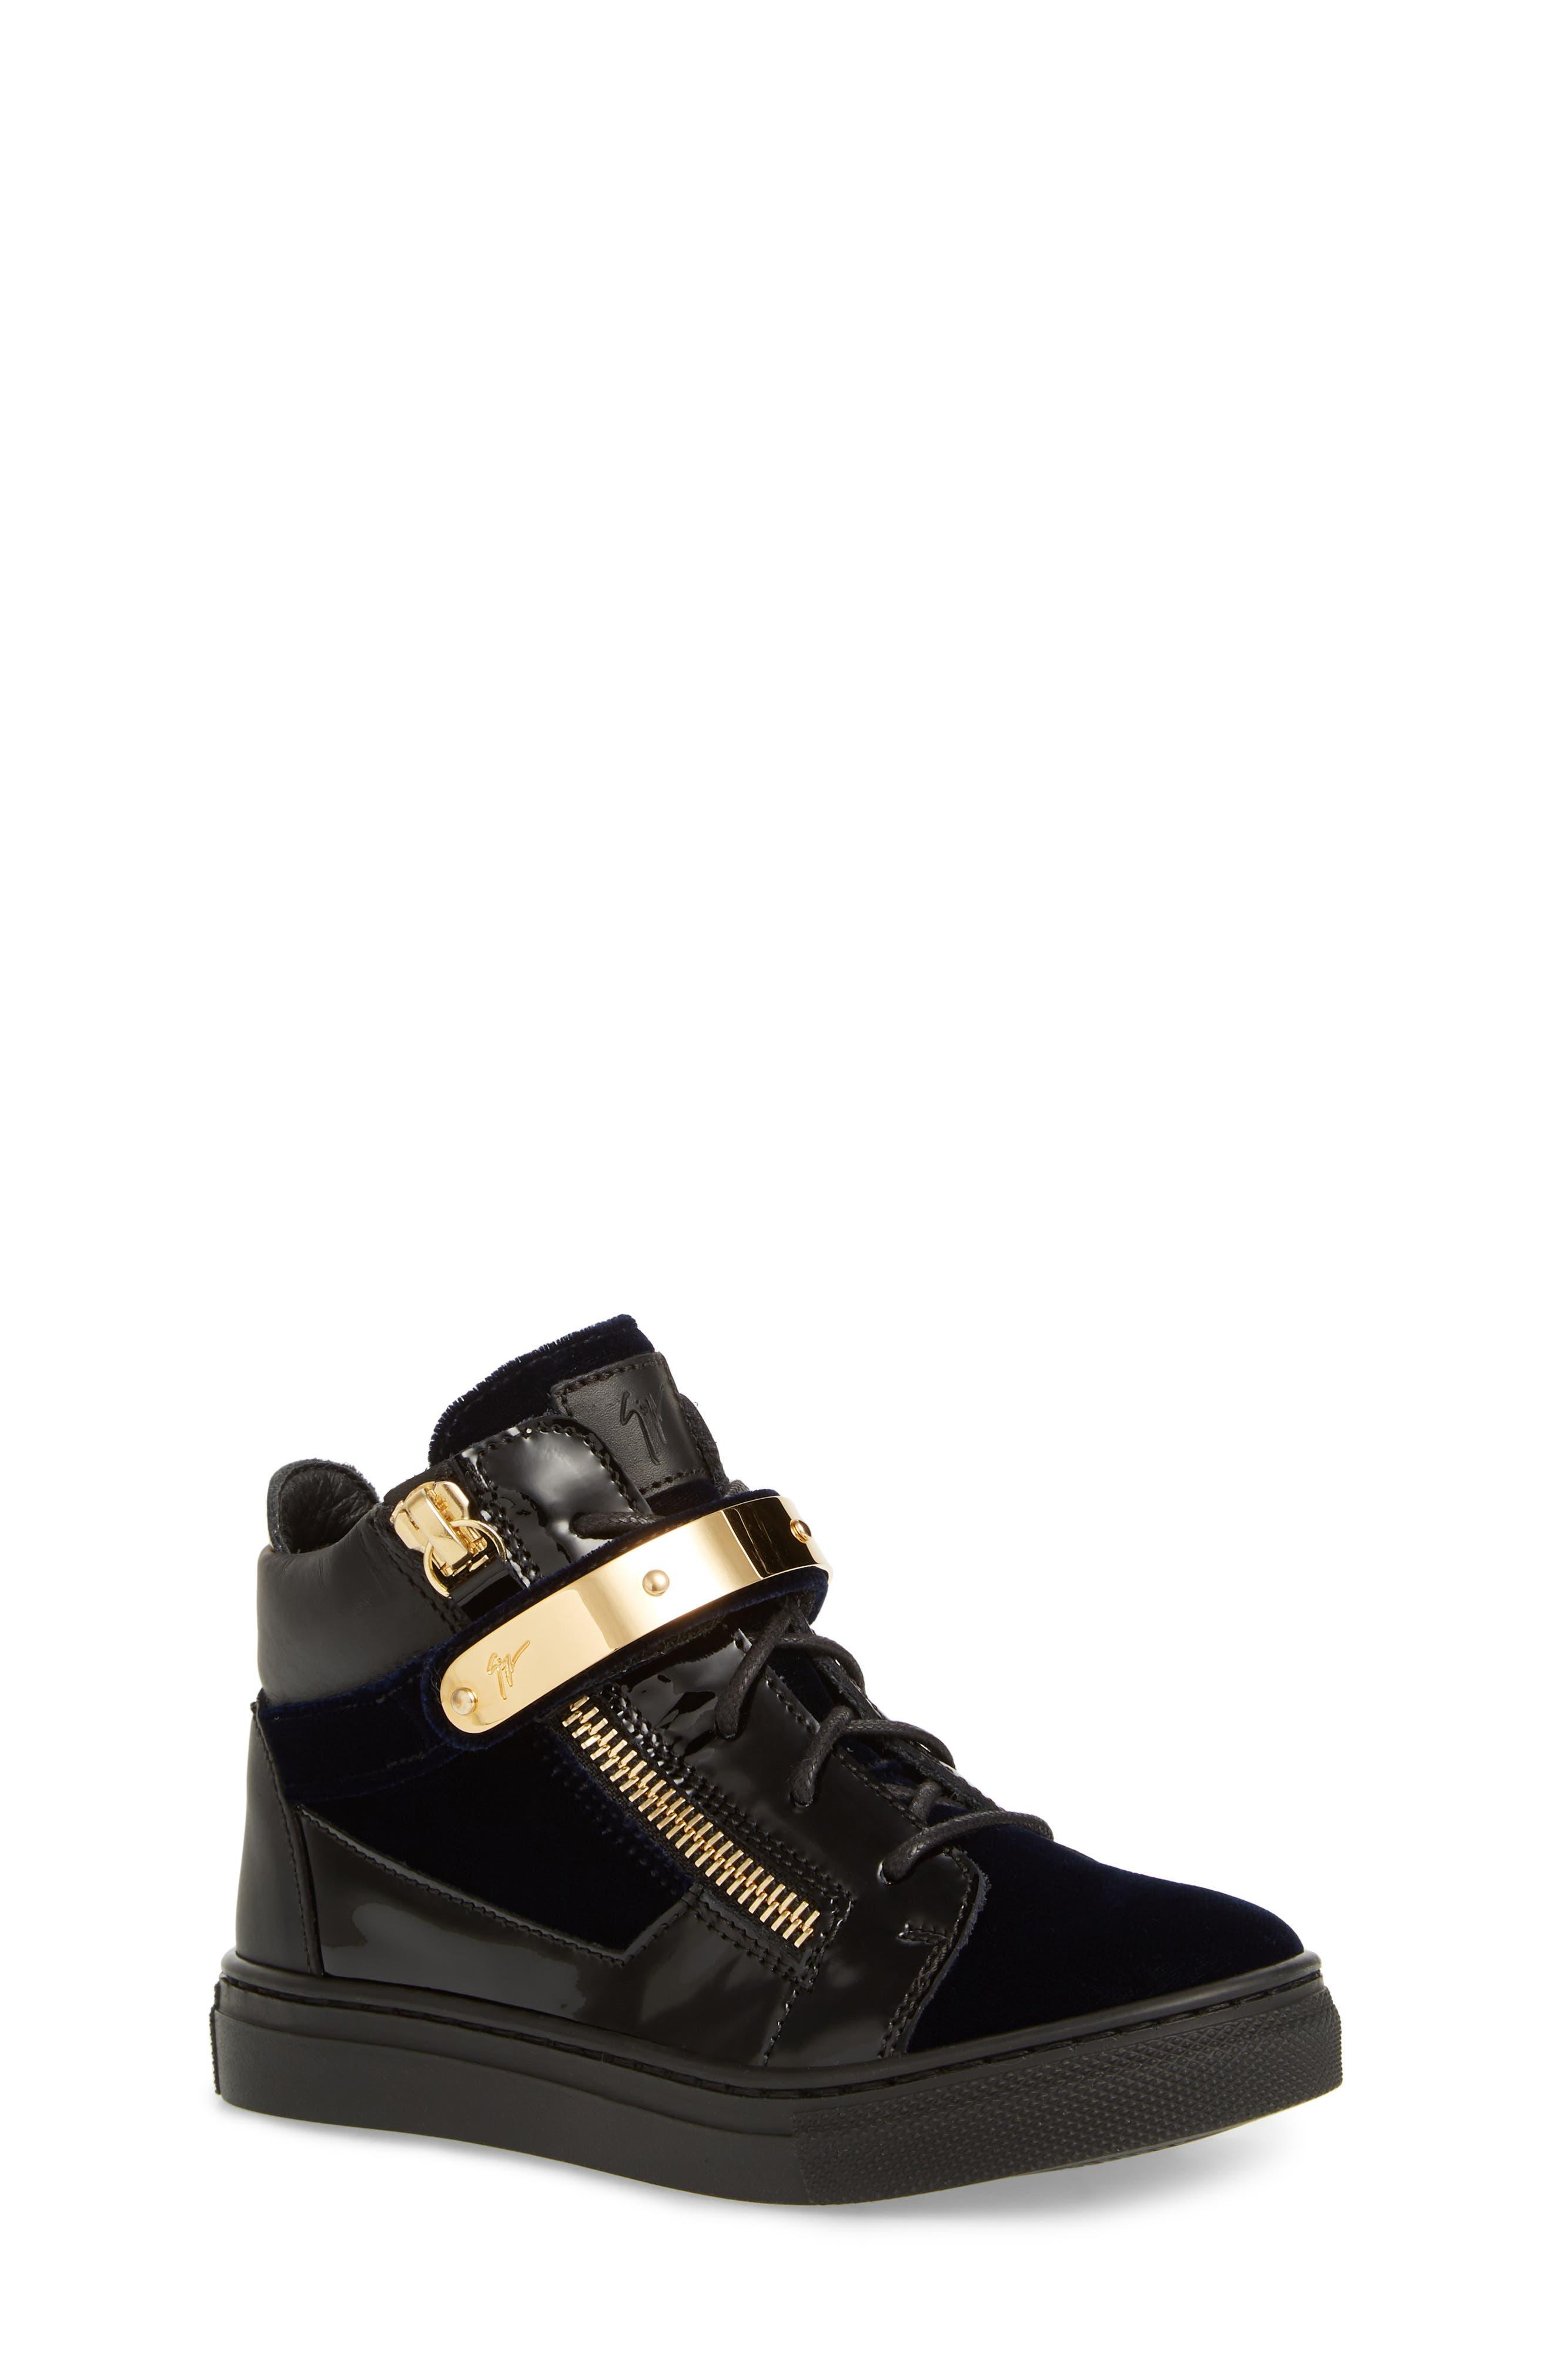 Gomma London Sneaker,                         Main,                         color,